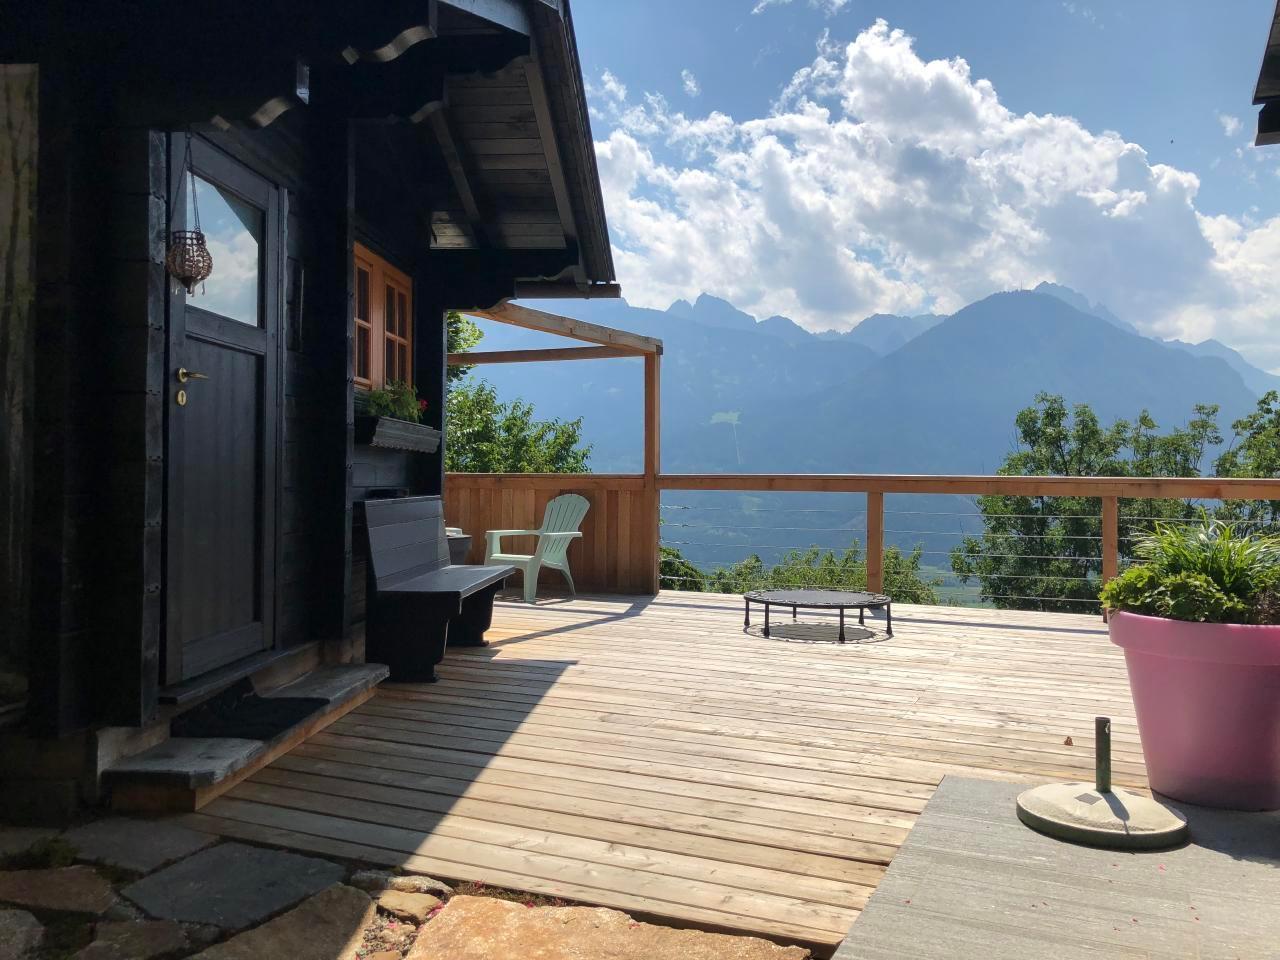 Maison de vacances Landhaus Osttirol (2299545), Dölsach, Osttirol, Tyrol, Autriche, image 38